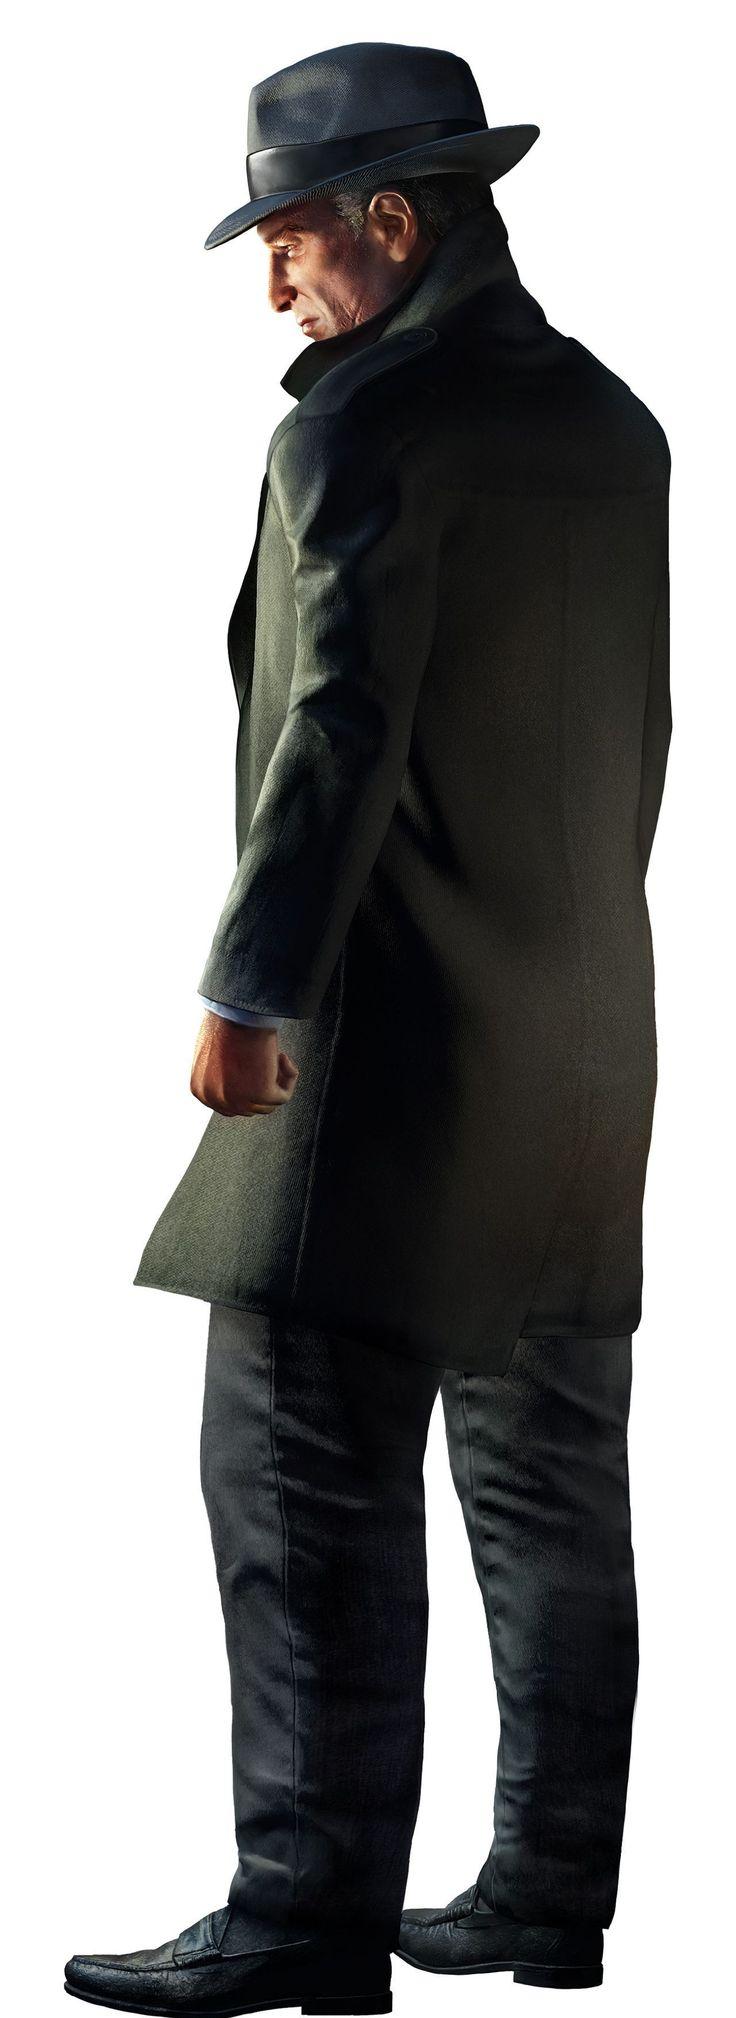 En gangster - Vito Scaletta.